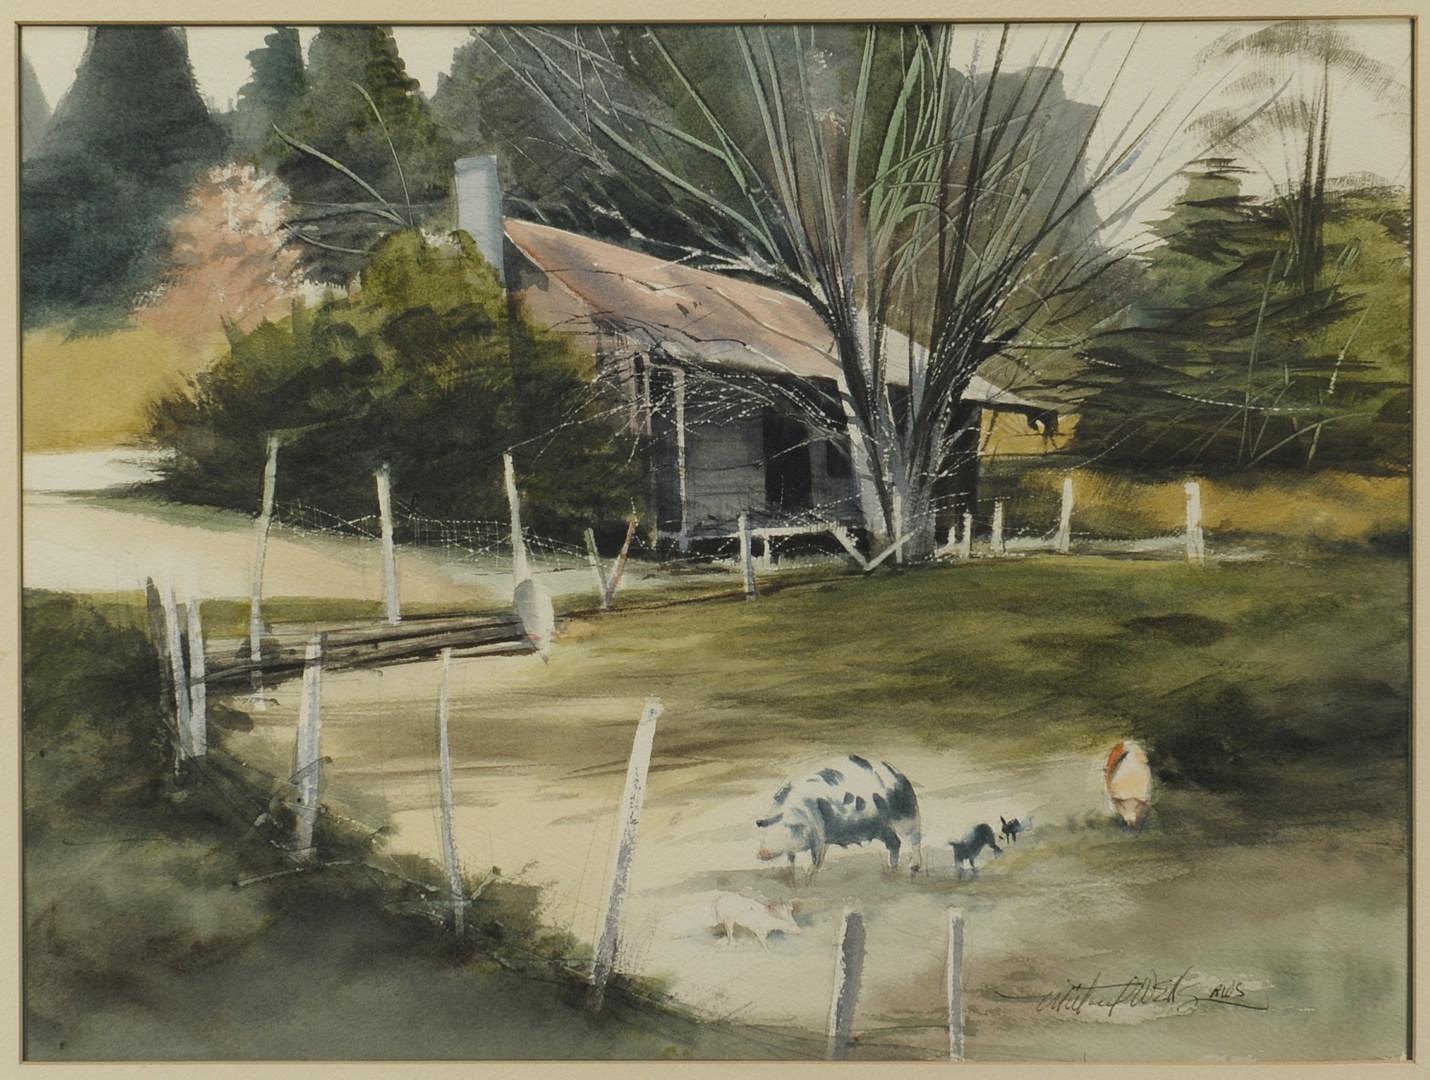 Lot 369: Millard Wells Watercolor